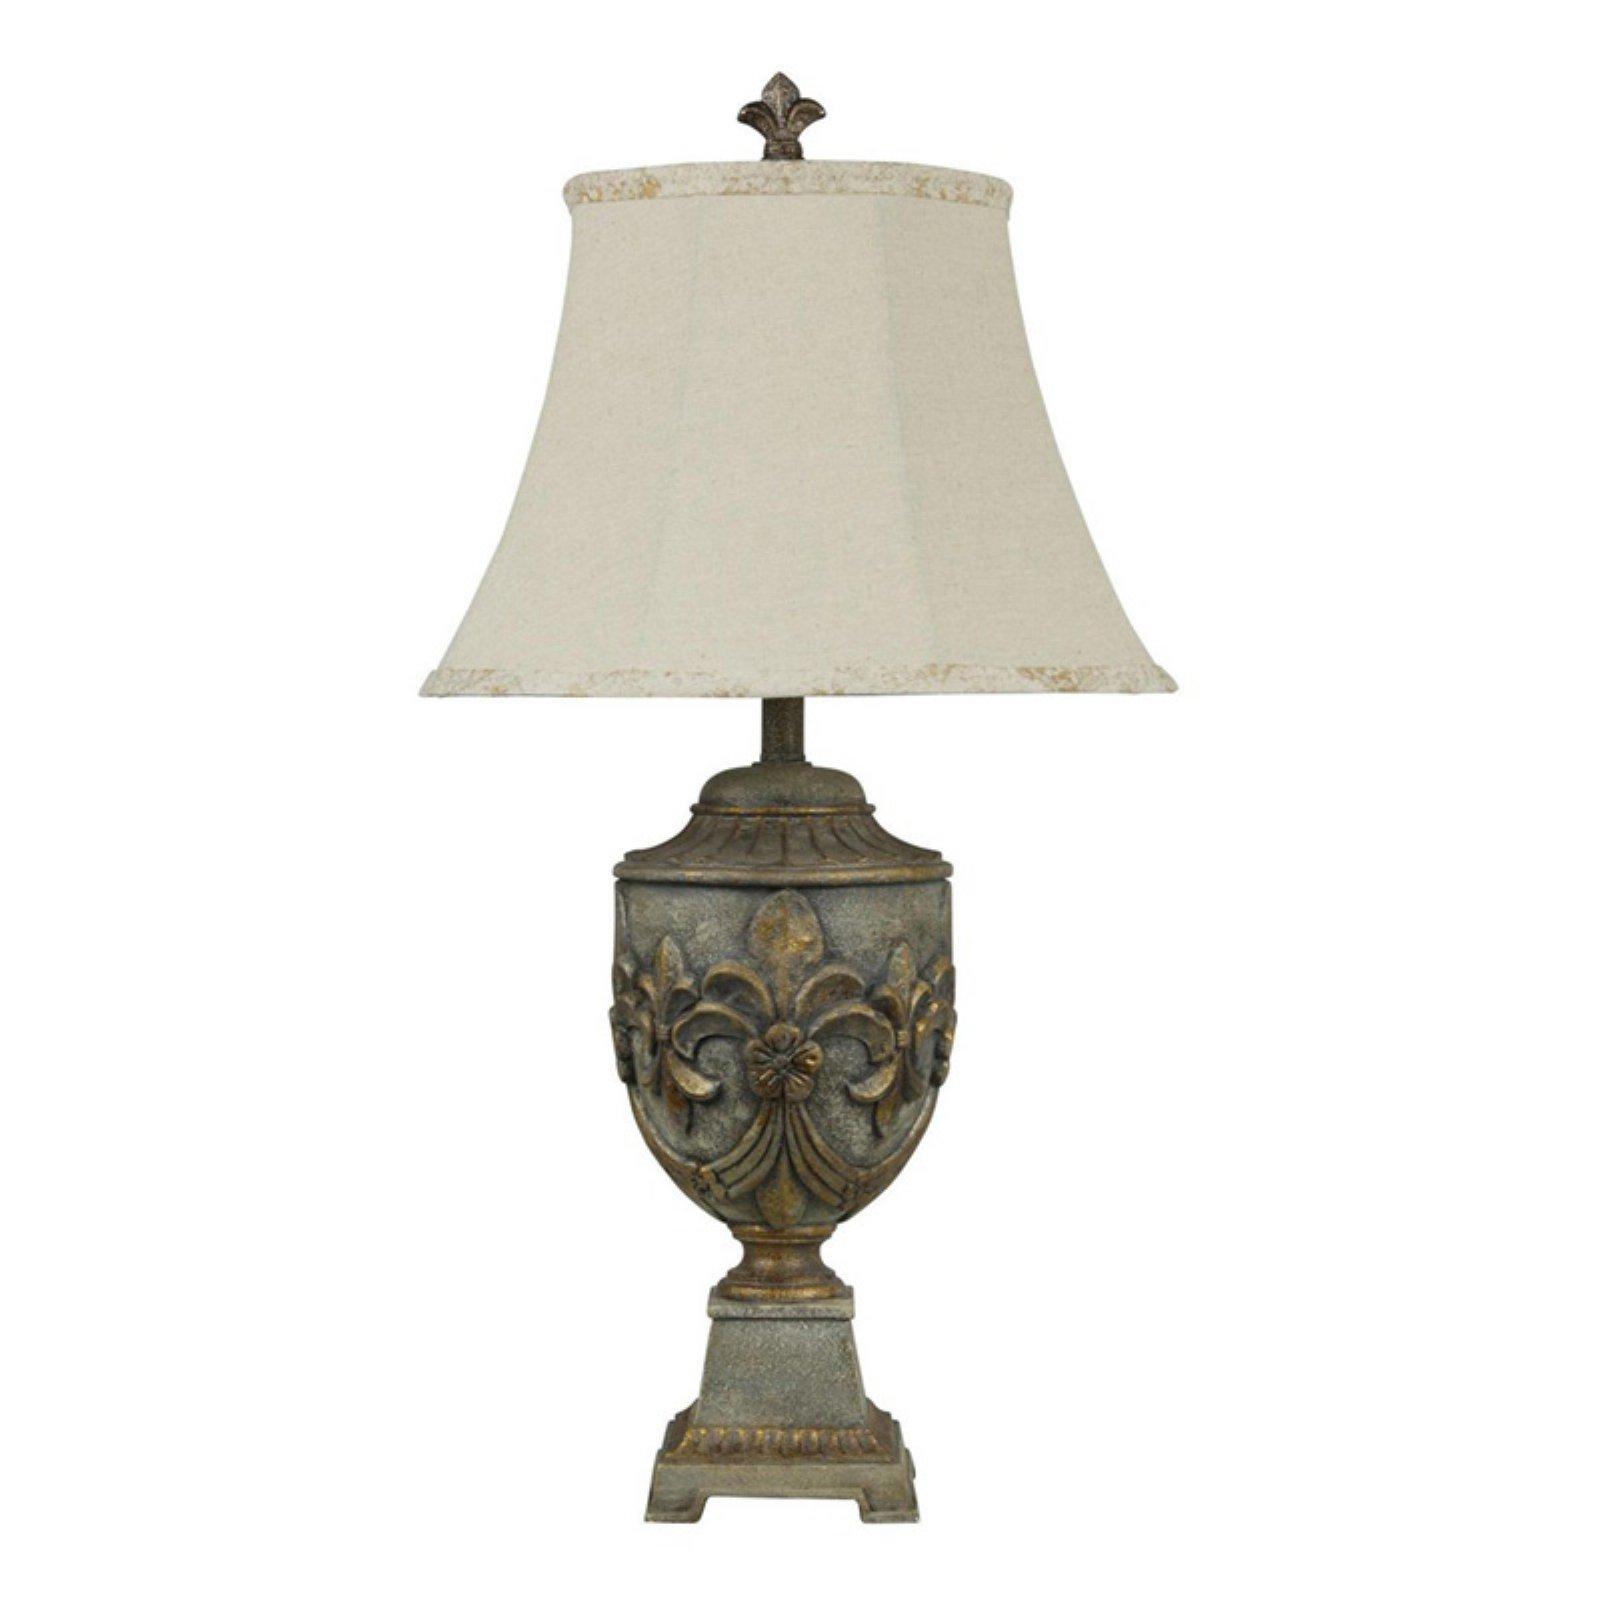 Stylecraft Fleur De Lis Table Lamp In Versailles Finish Walmart Com